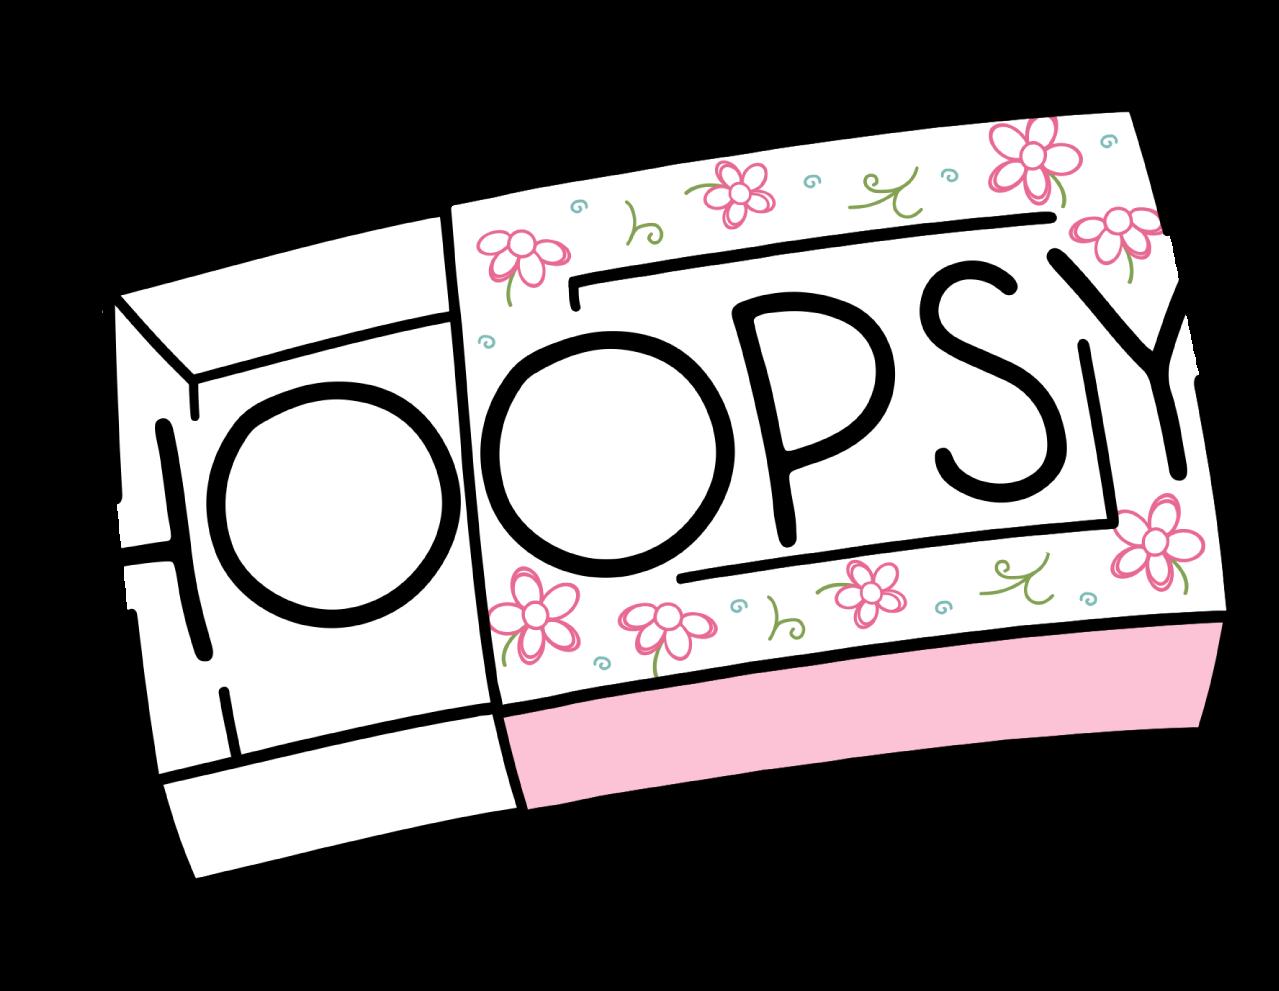 Hoopsy